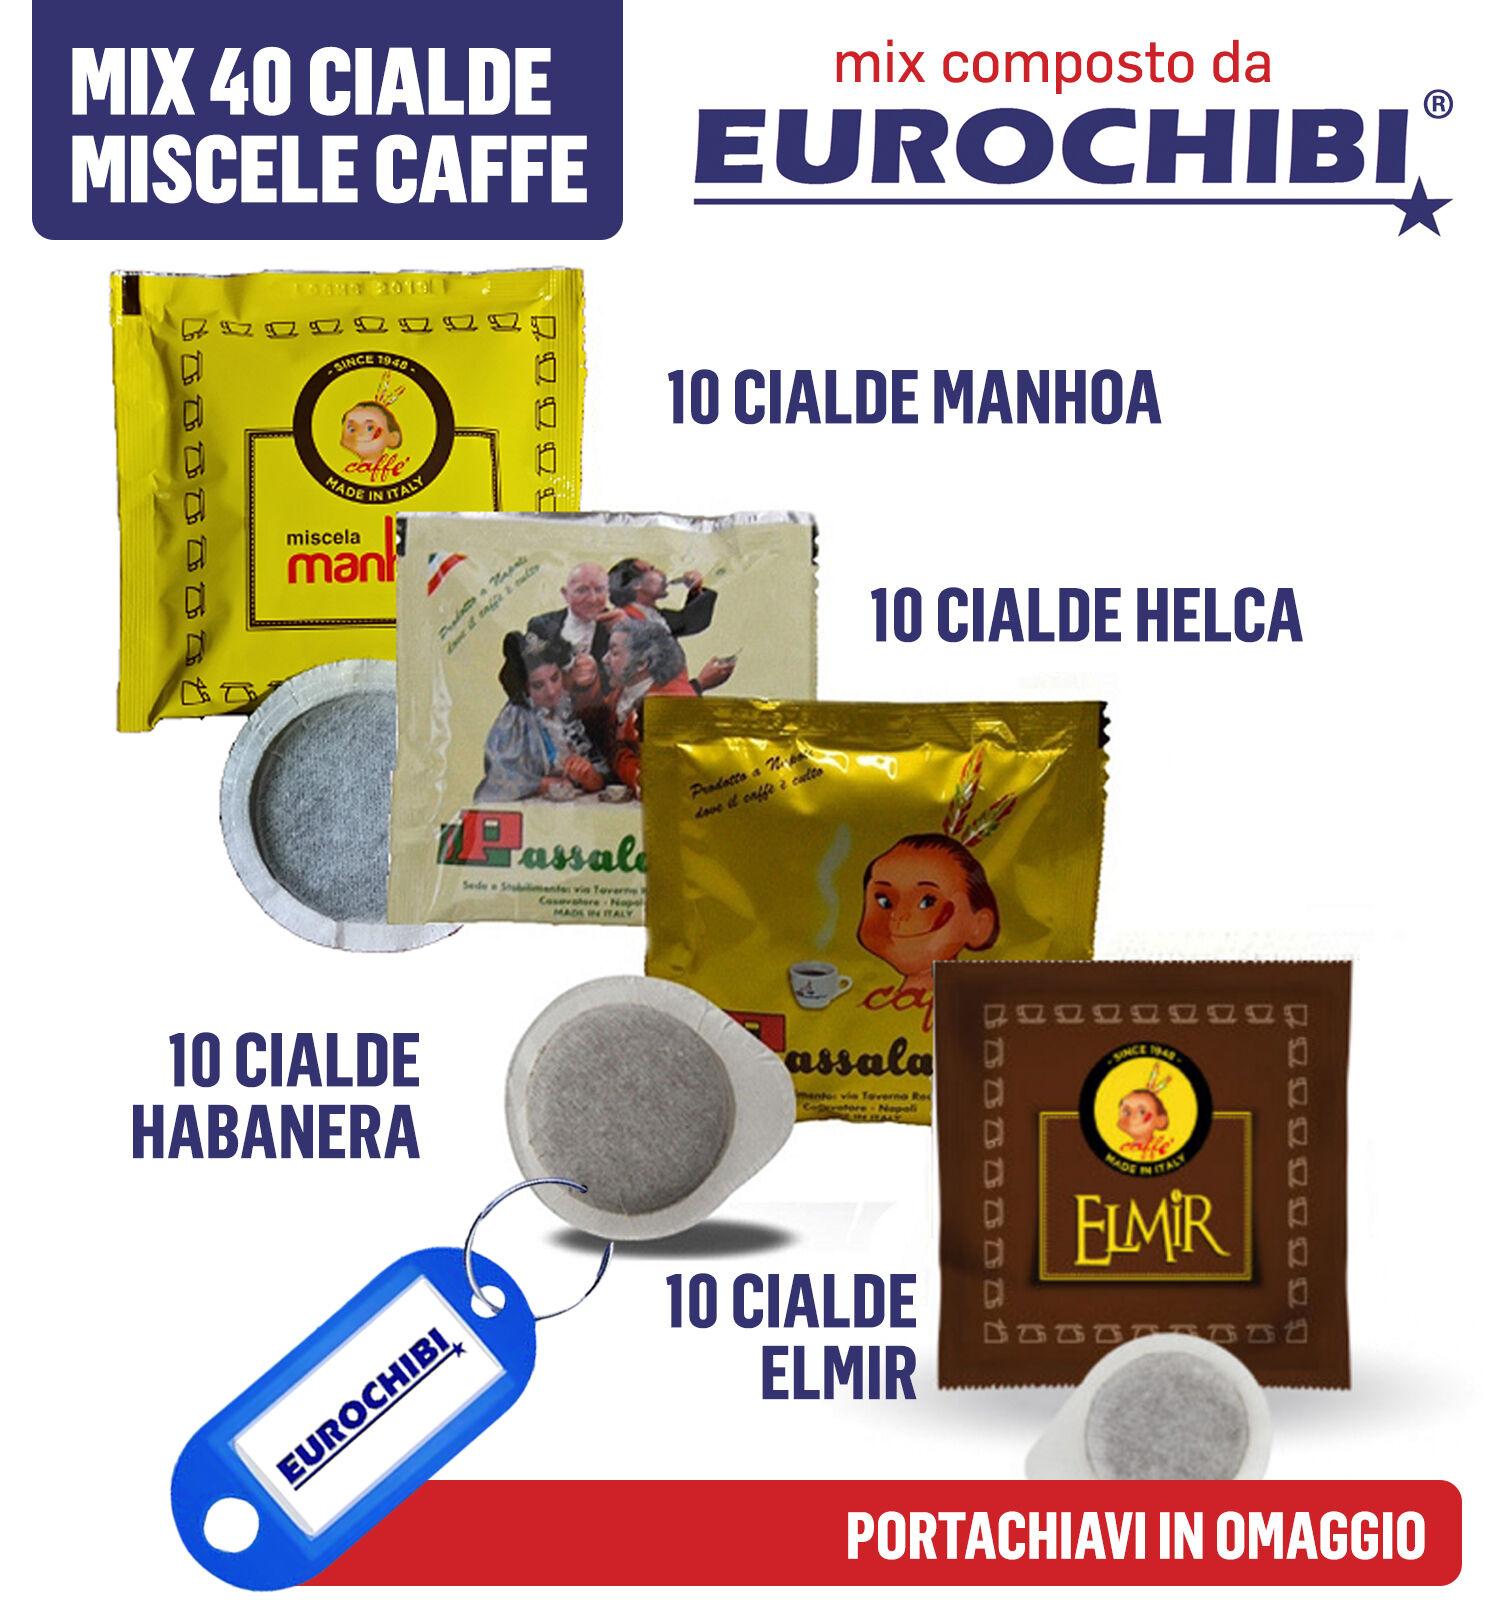 Eurochibi Mini Mix 40 Cialde Caffè Passalacqua - 10 Manhoa - 10 Helca - 10 Habanera - 10 Elmir Con 1 Esclusivo Portachiavi ®